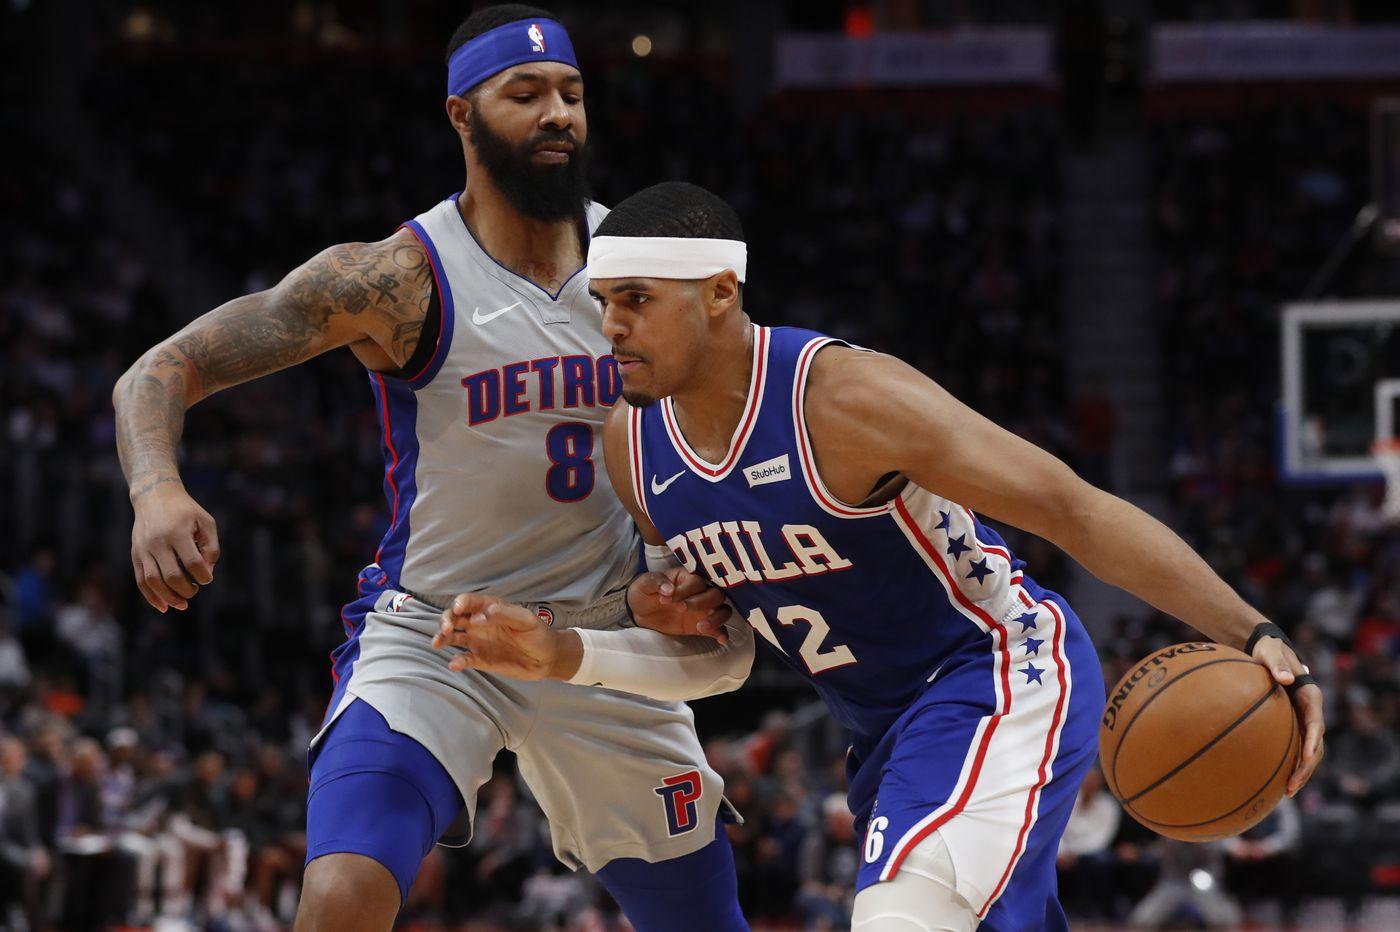 Tobias Harris, Ben Simmons lead Sixers over Pistons